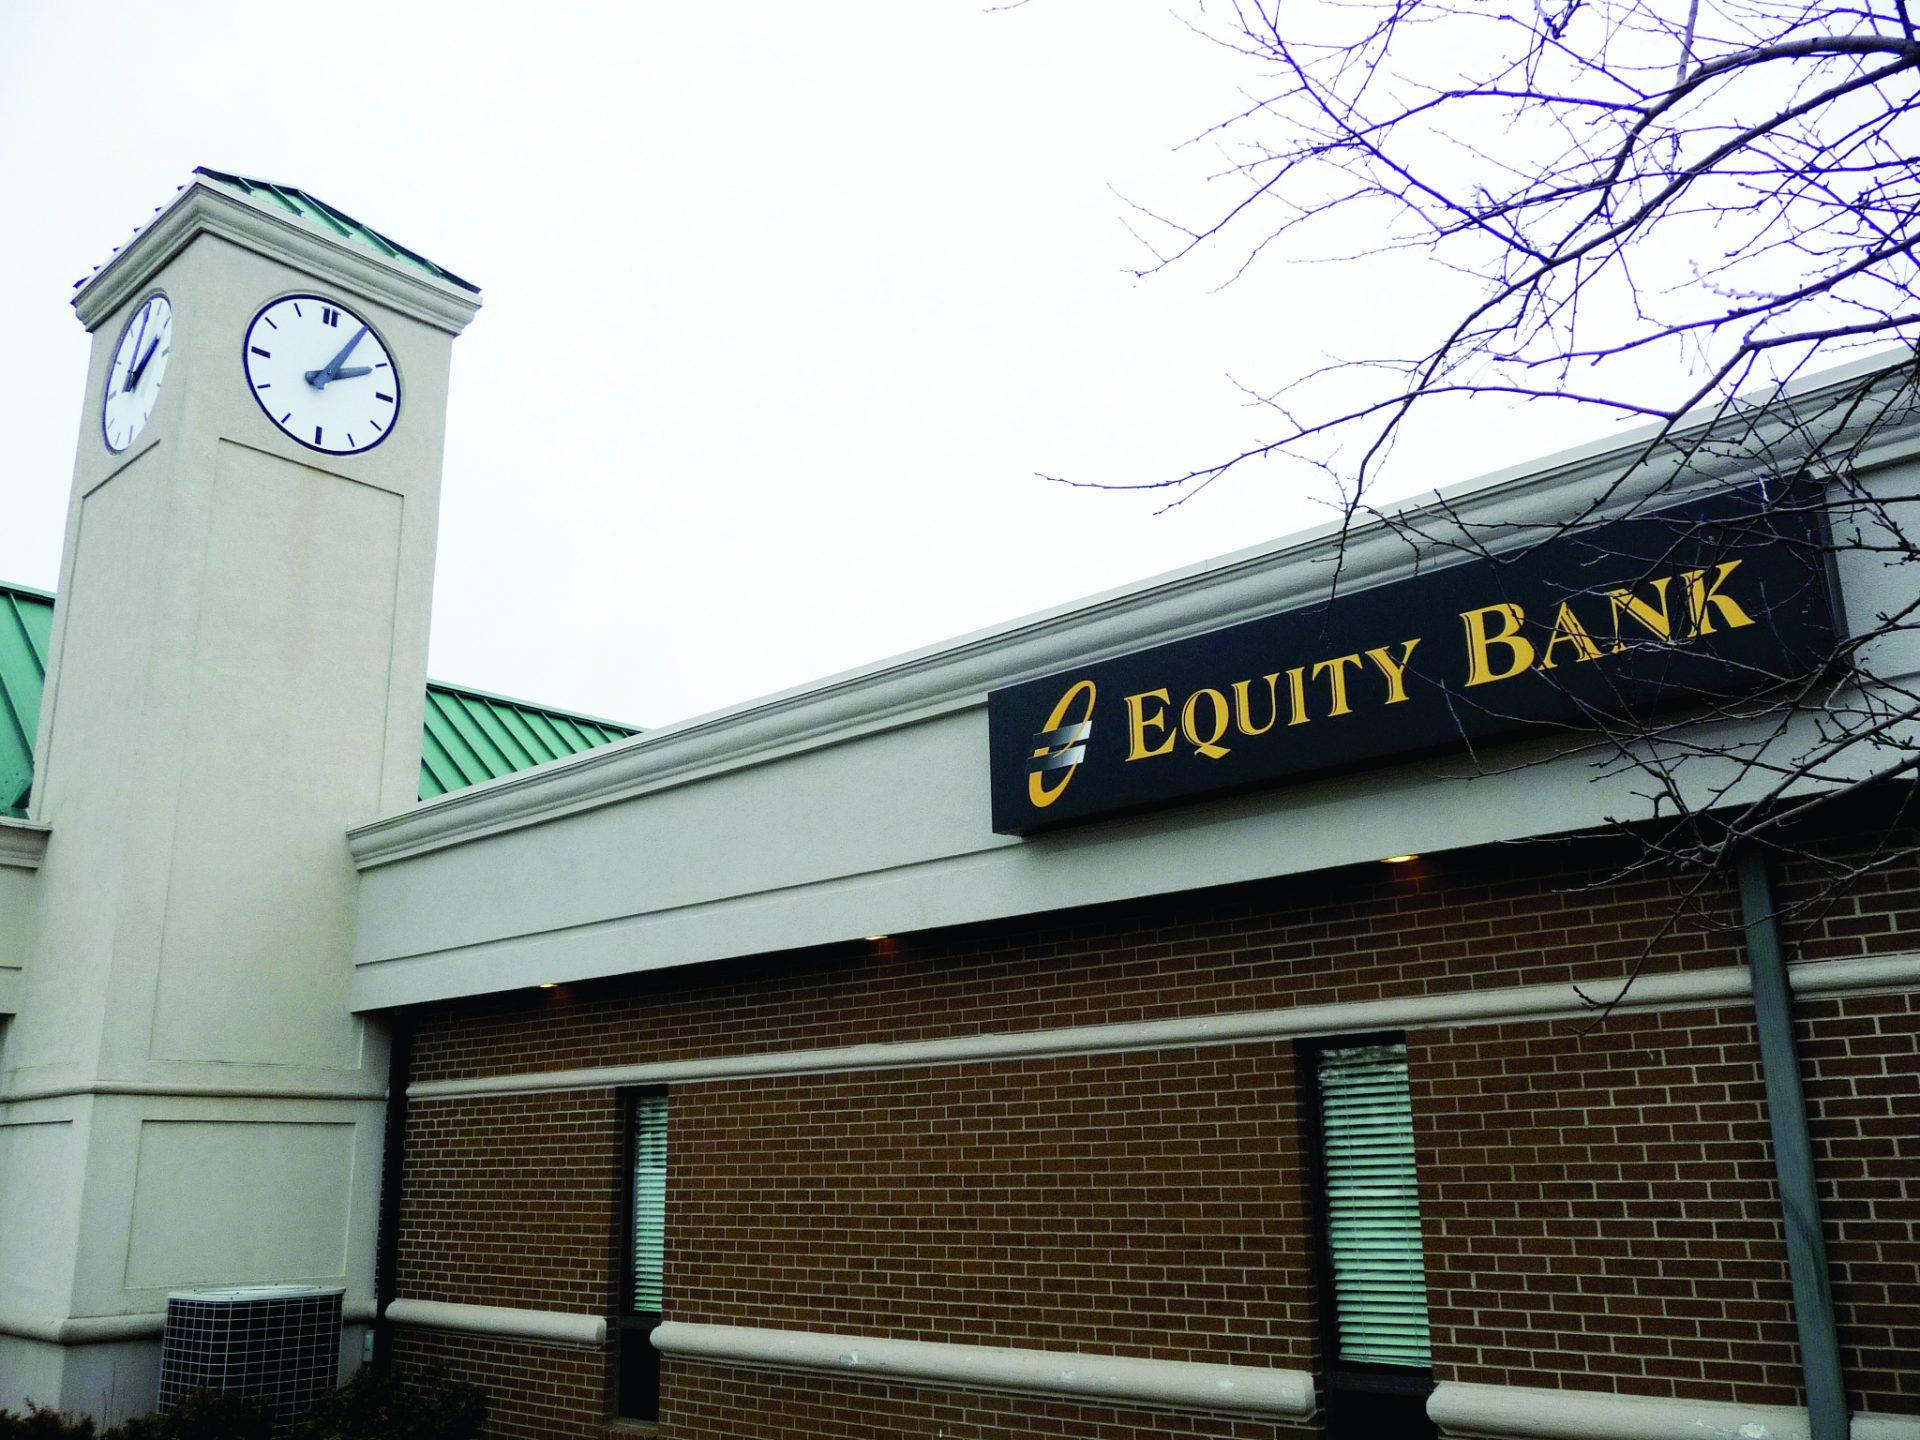 Equity Bank Sedalia branch exterior.